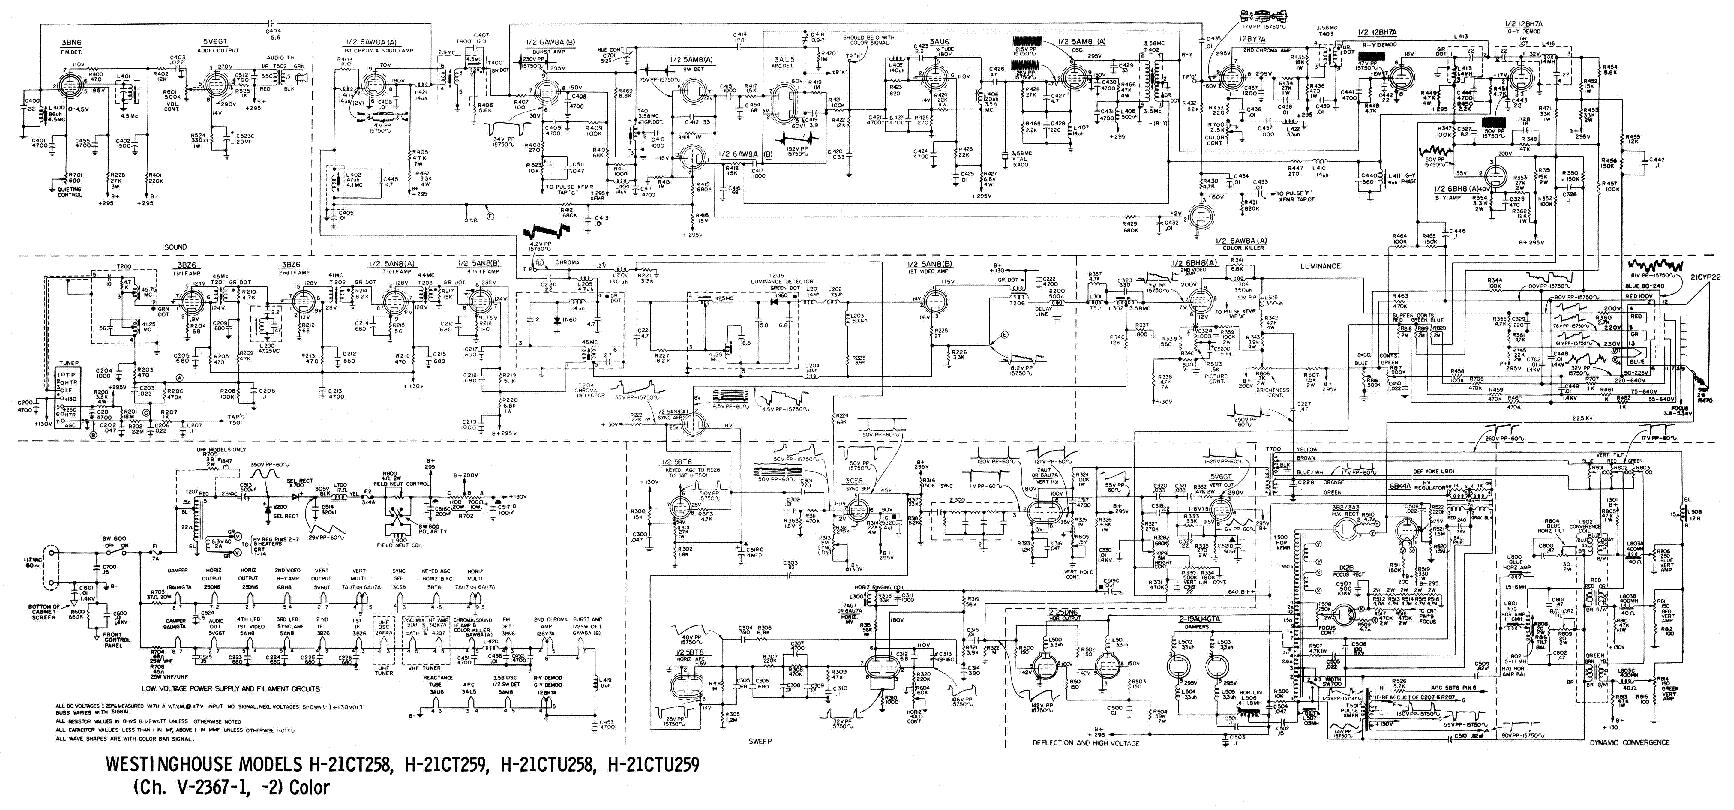 Westinghouse Tv Schematic Diagram Start Building A Wiring Samsung Circuit Board W33001 Service Manual Download Schematics Eeprom Rh Elektrotanya Com Symbols